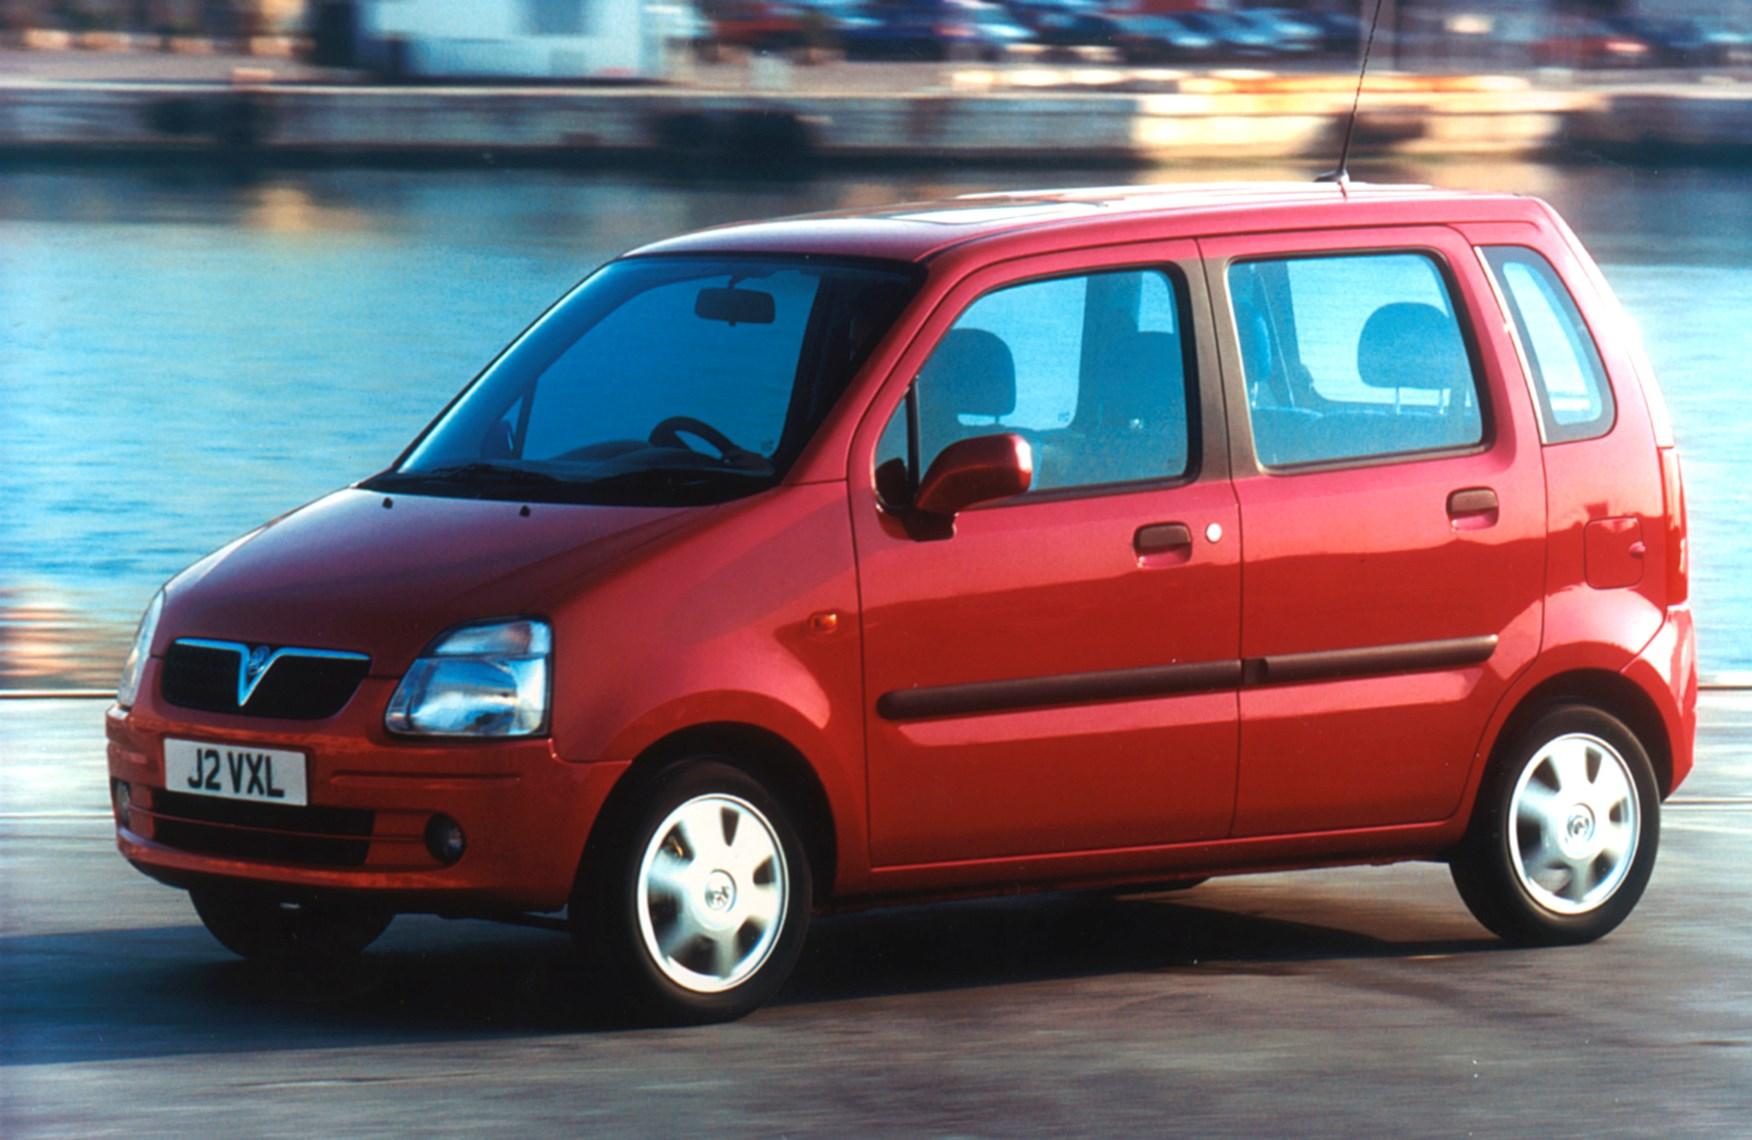 Opel Agila A 2000 - 2004 Microvan #2